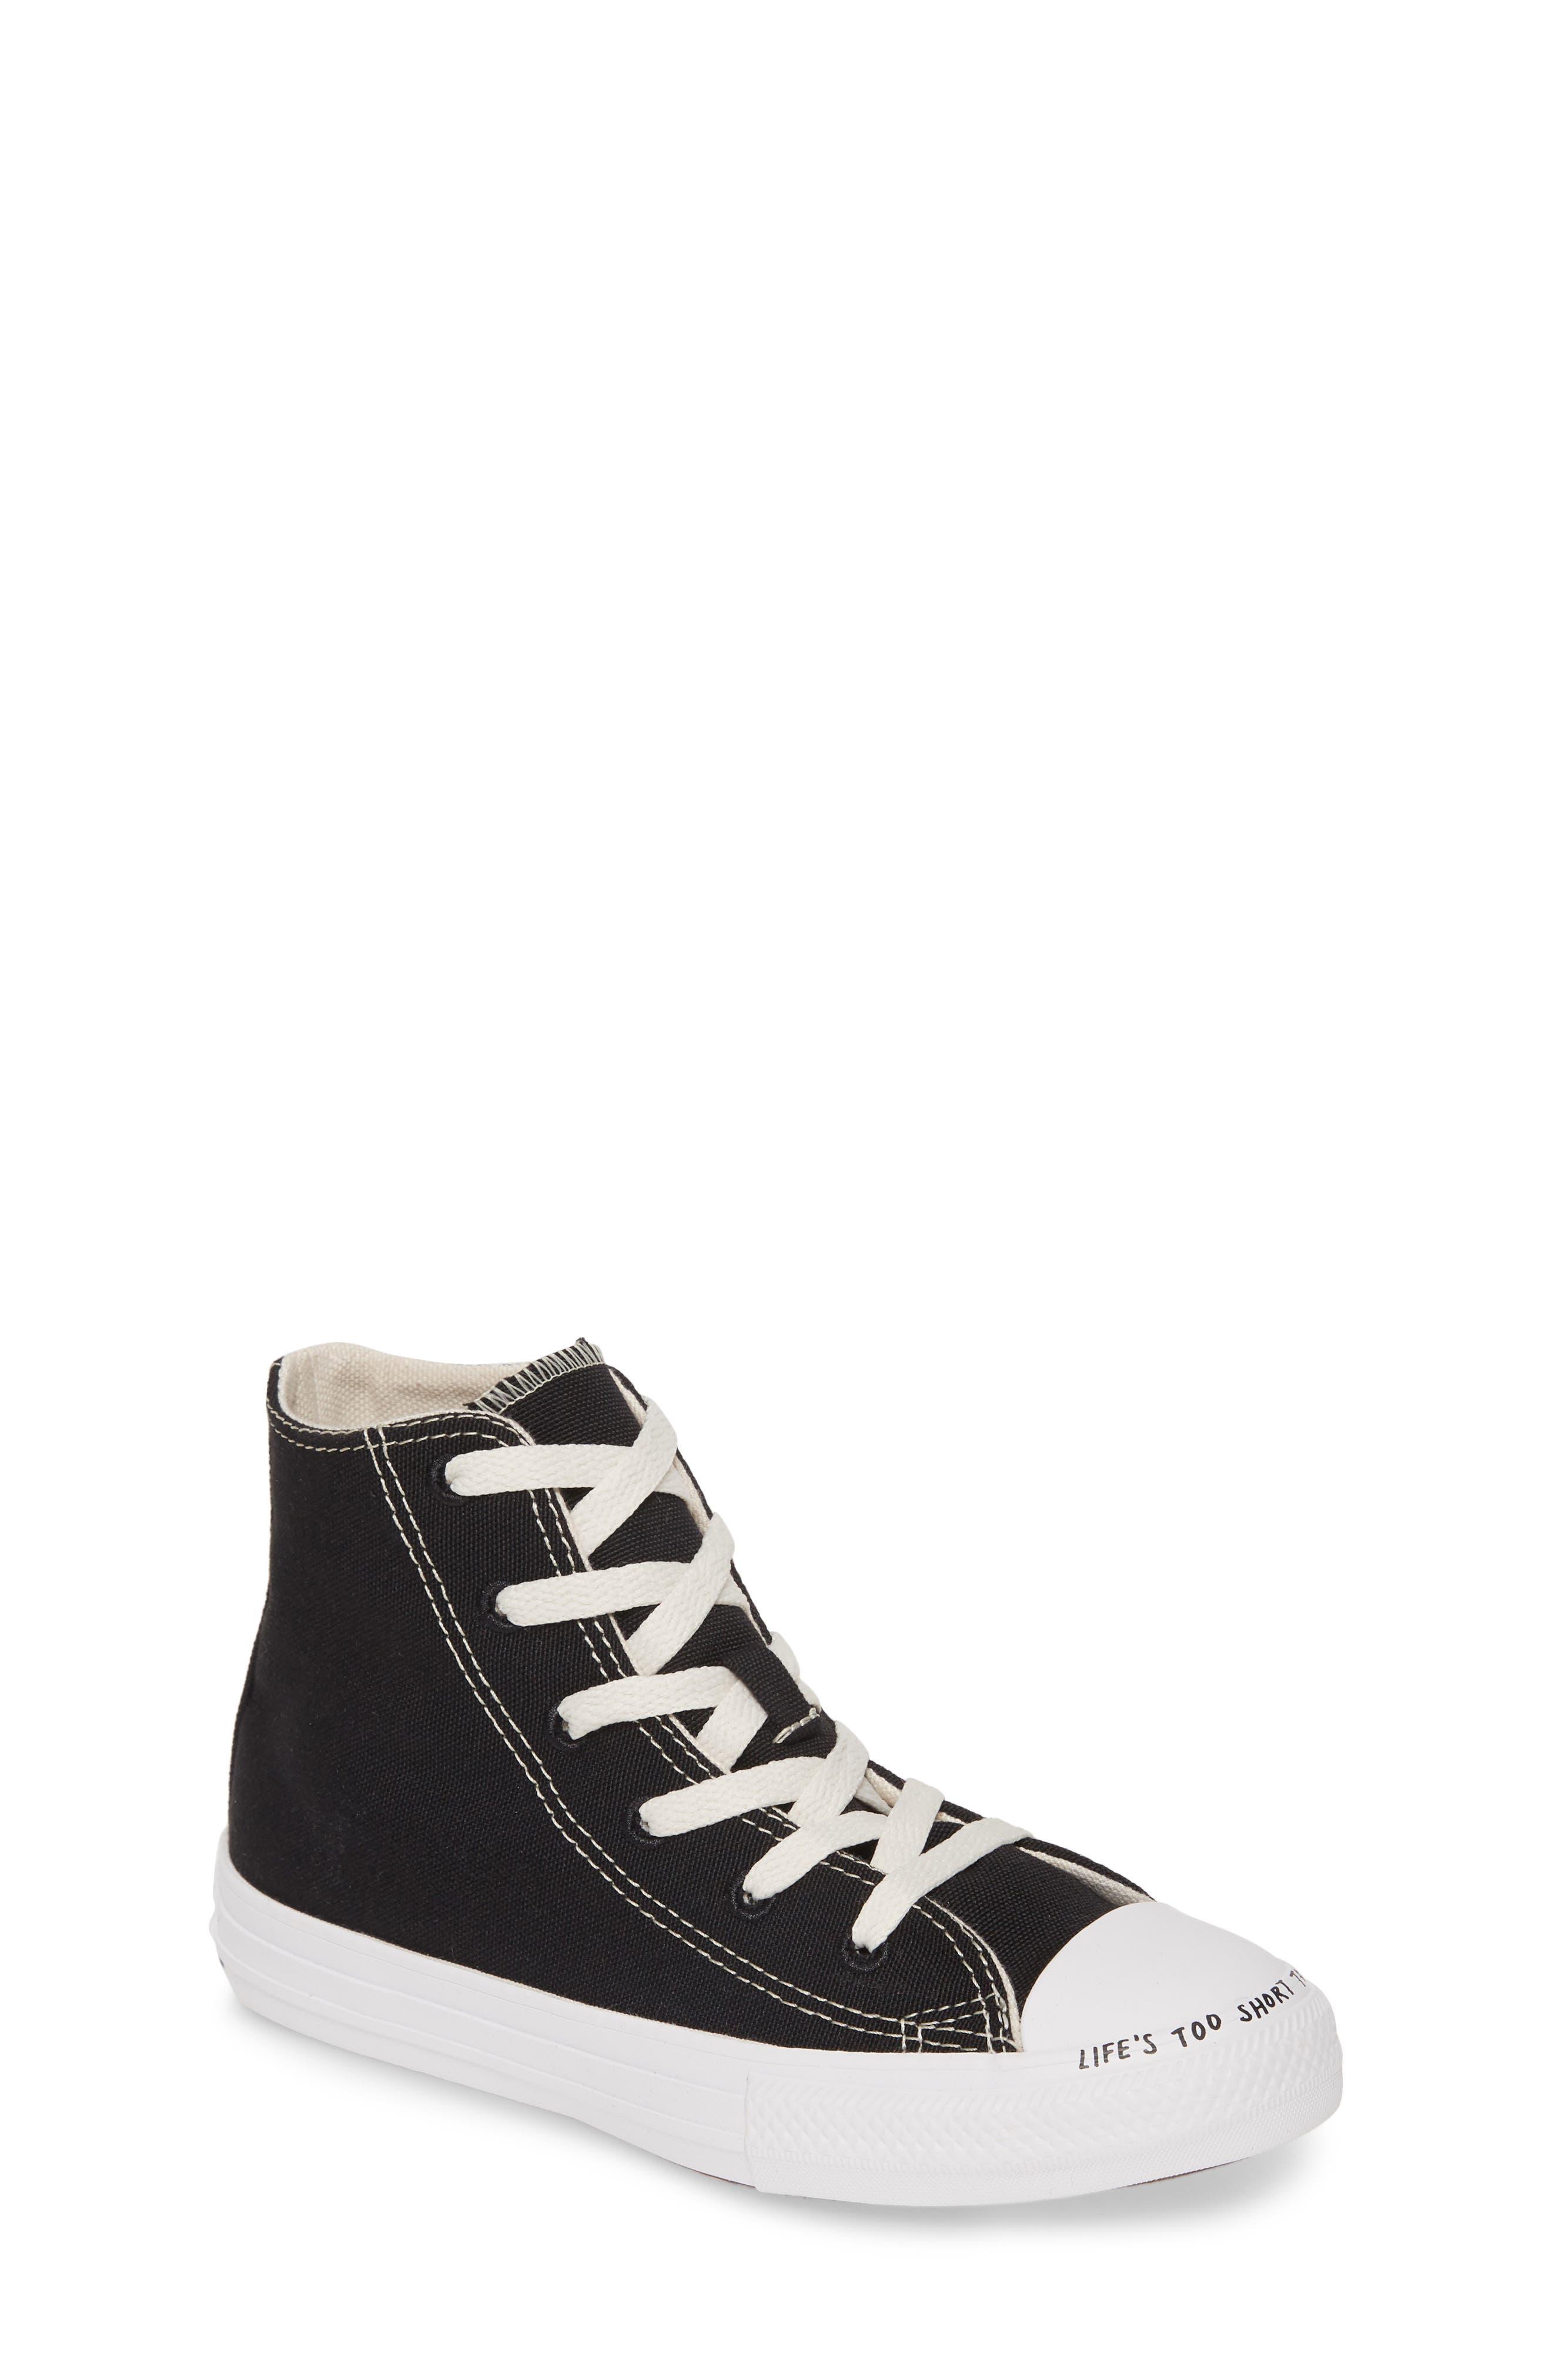 Converse Chuck Taylor All Star Renew High Top Sneaker